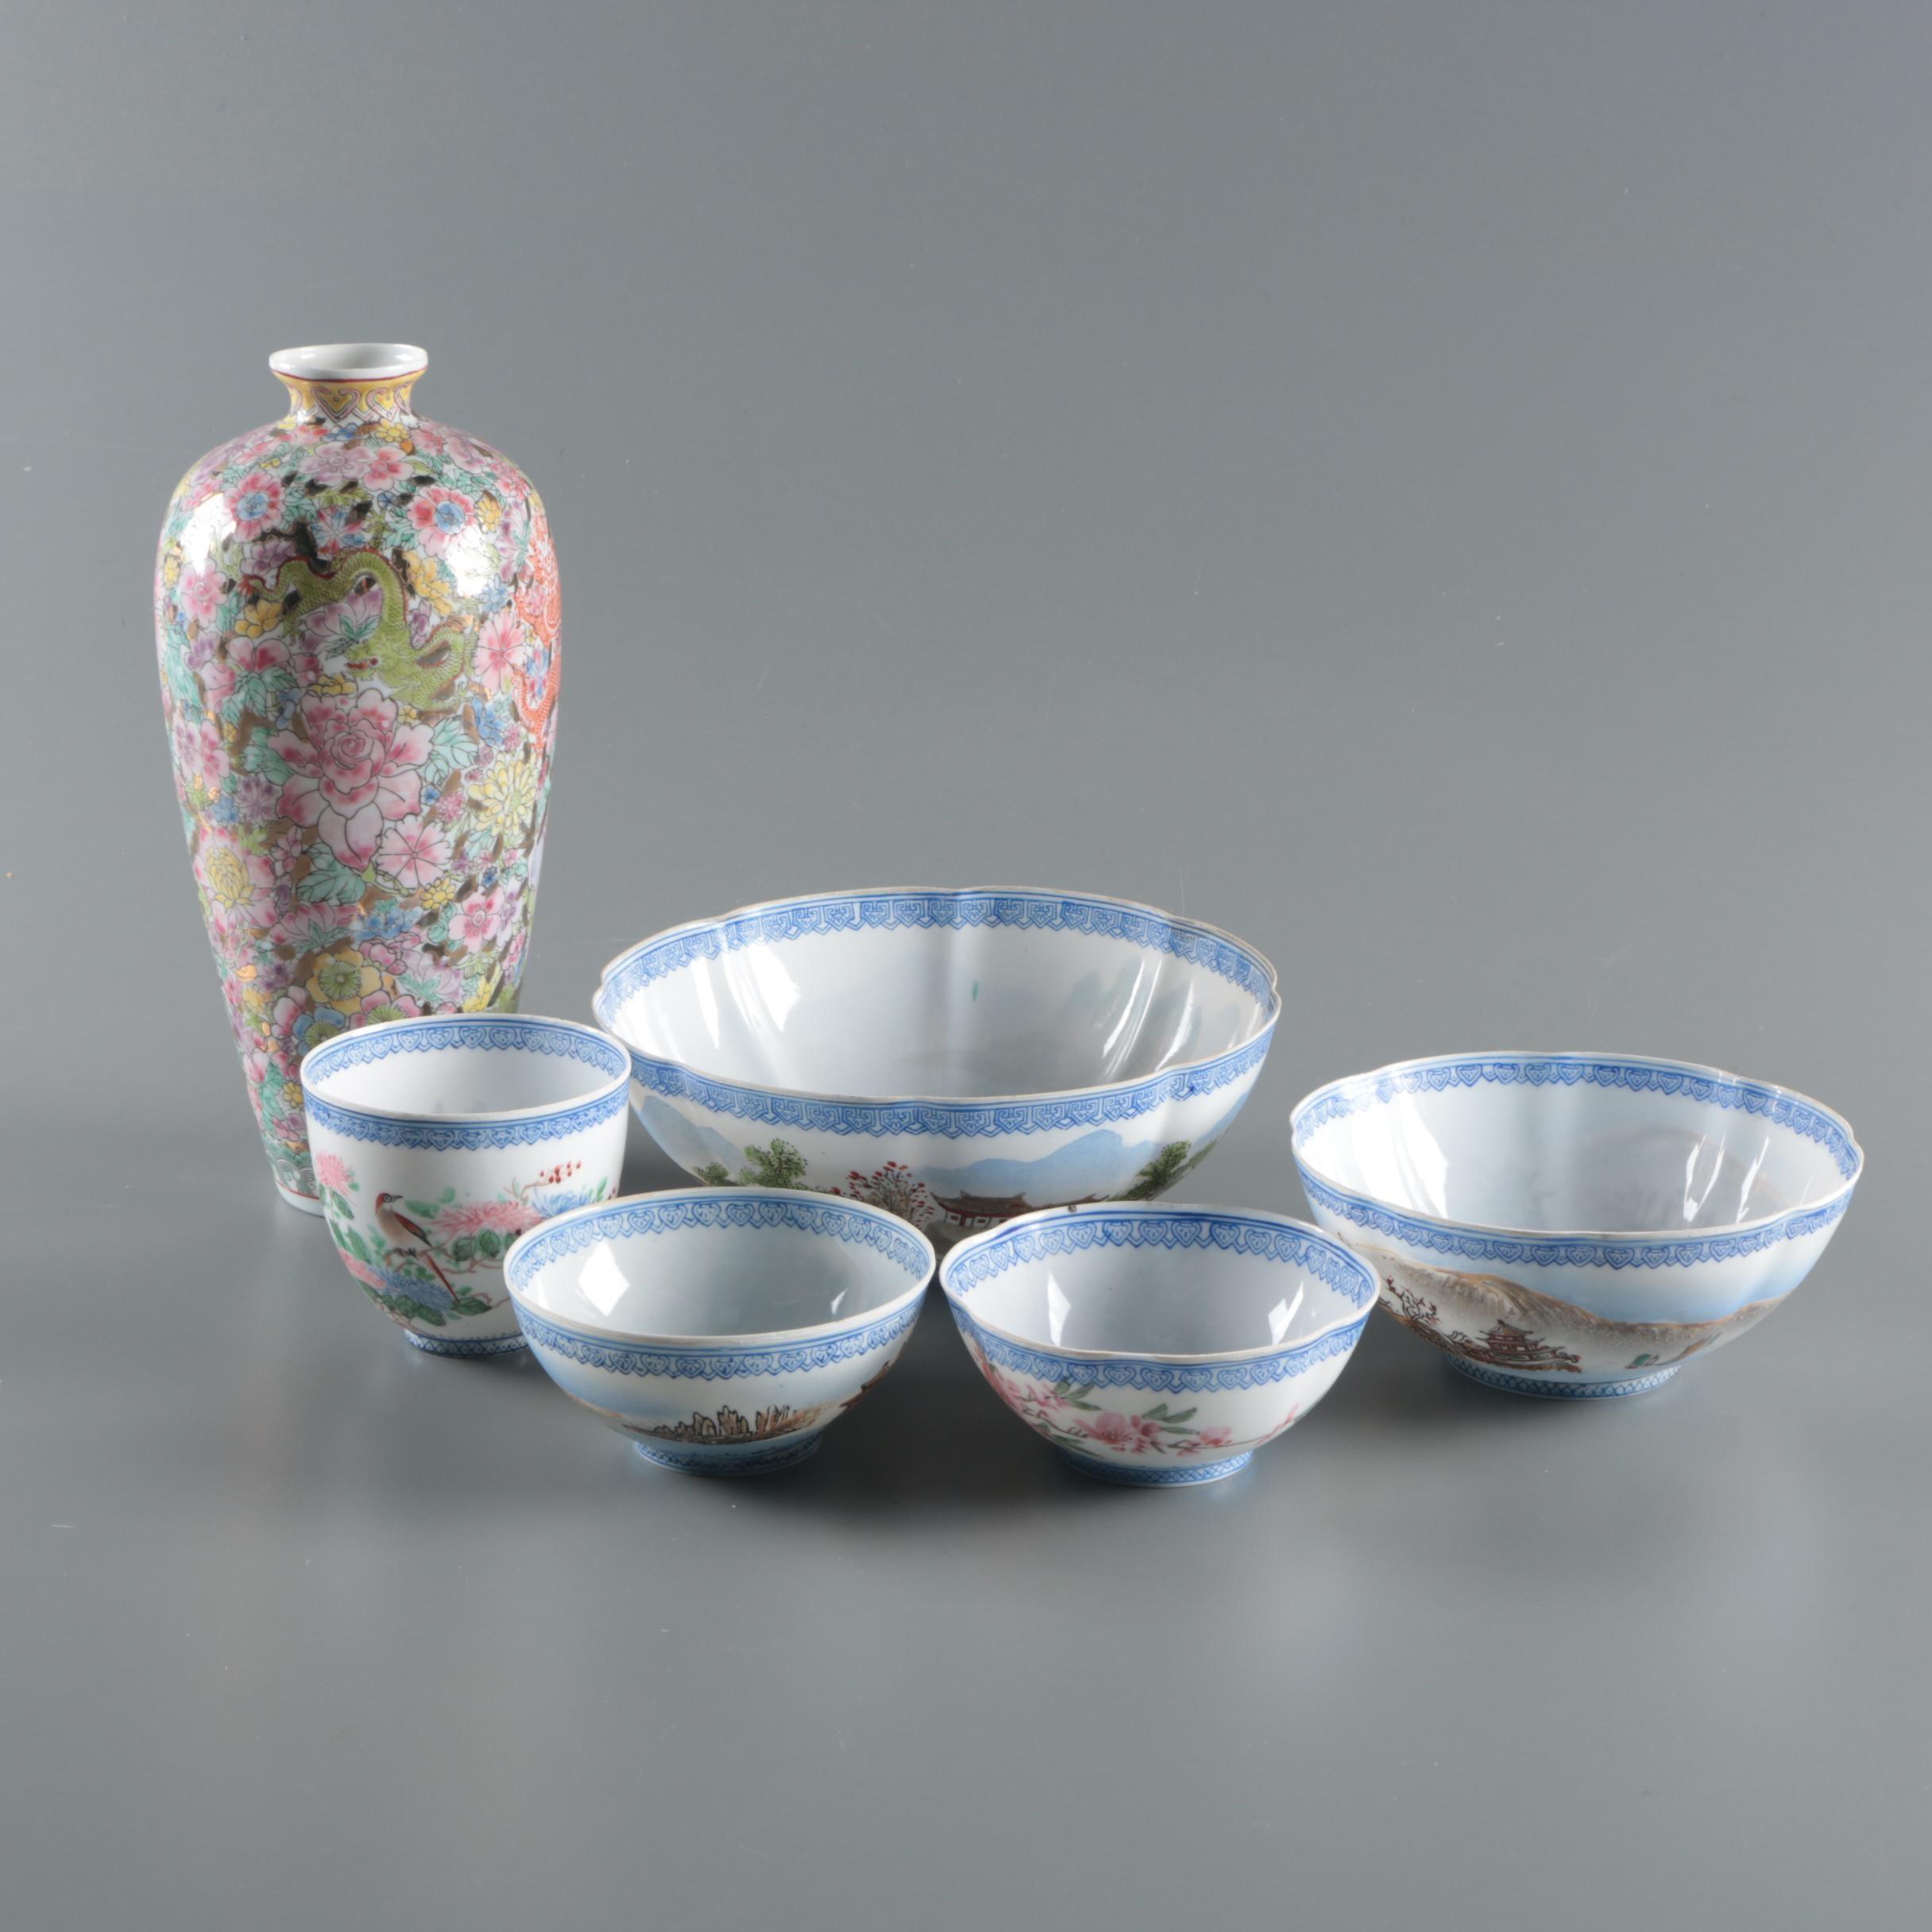 Chinese Export Eggshell Porcelain Serveware and Vase